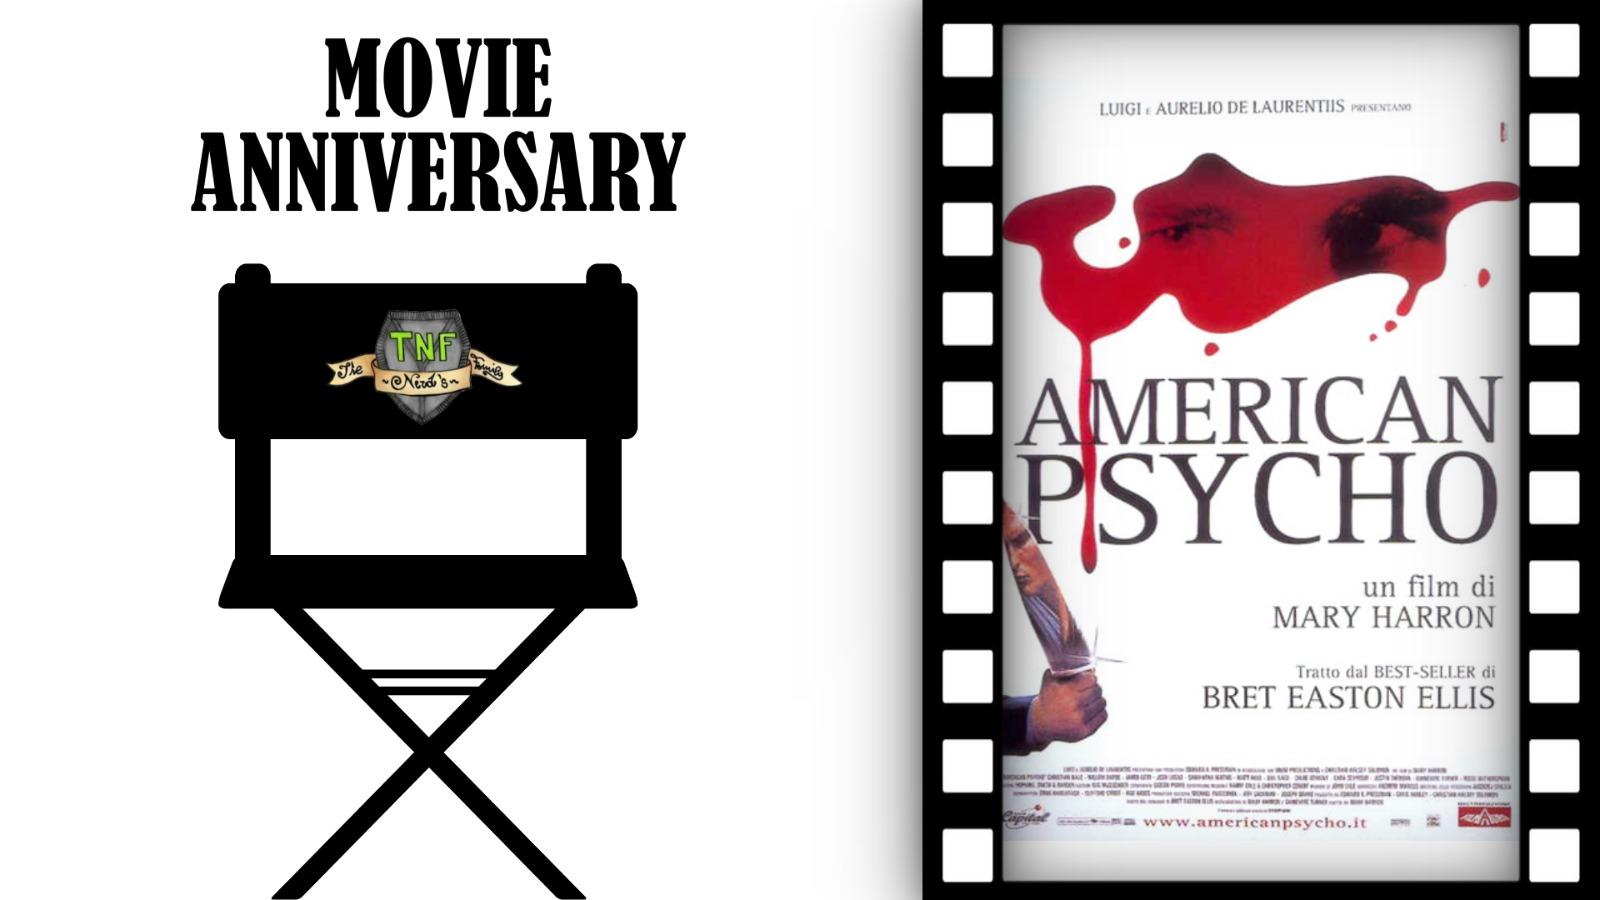 american psycho _movieanniversary